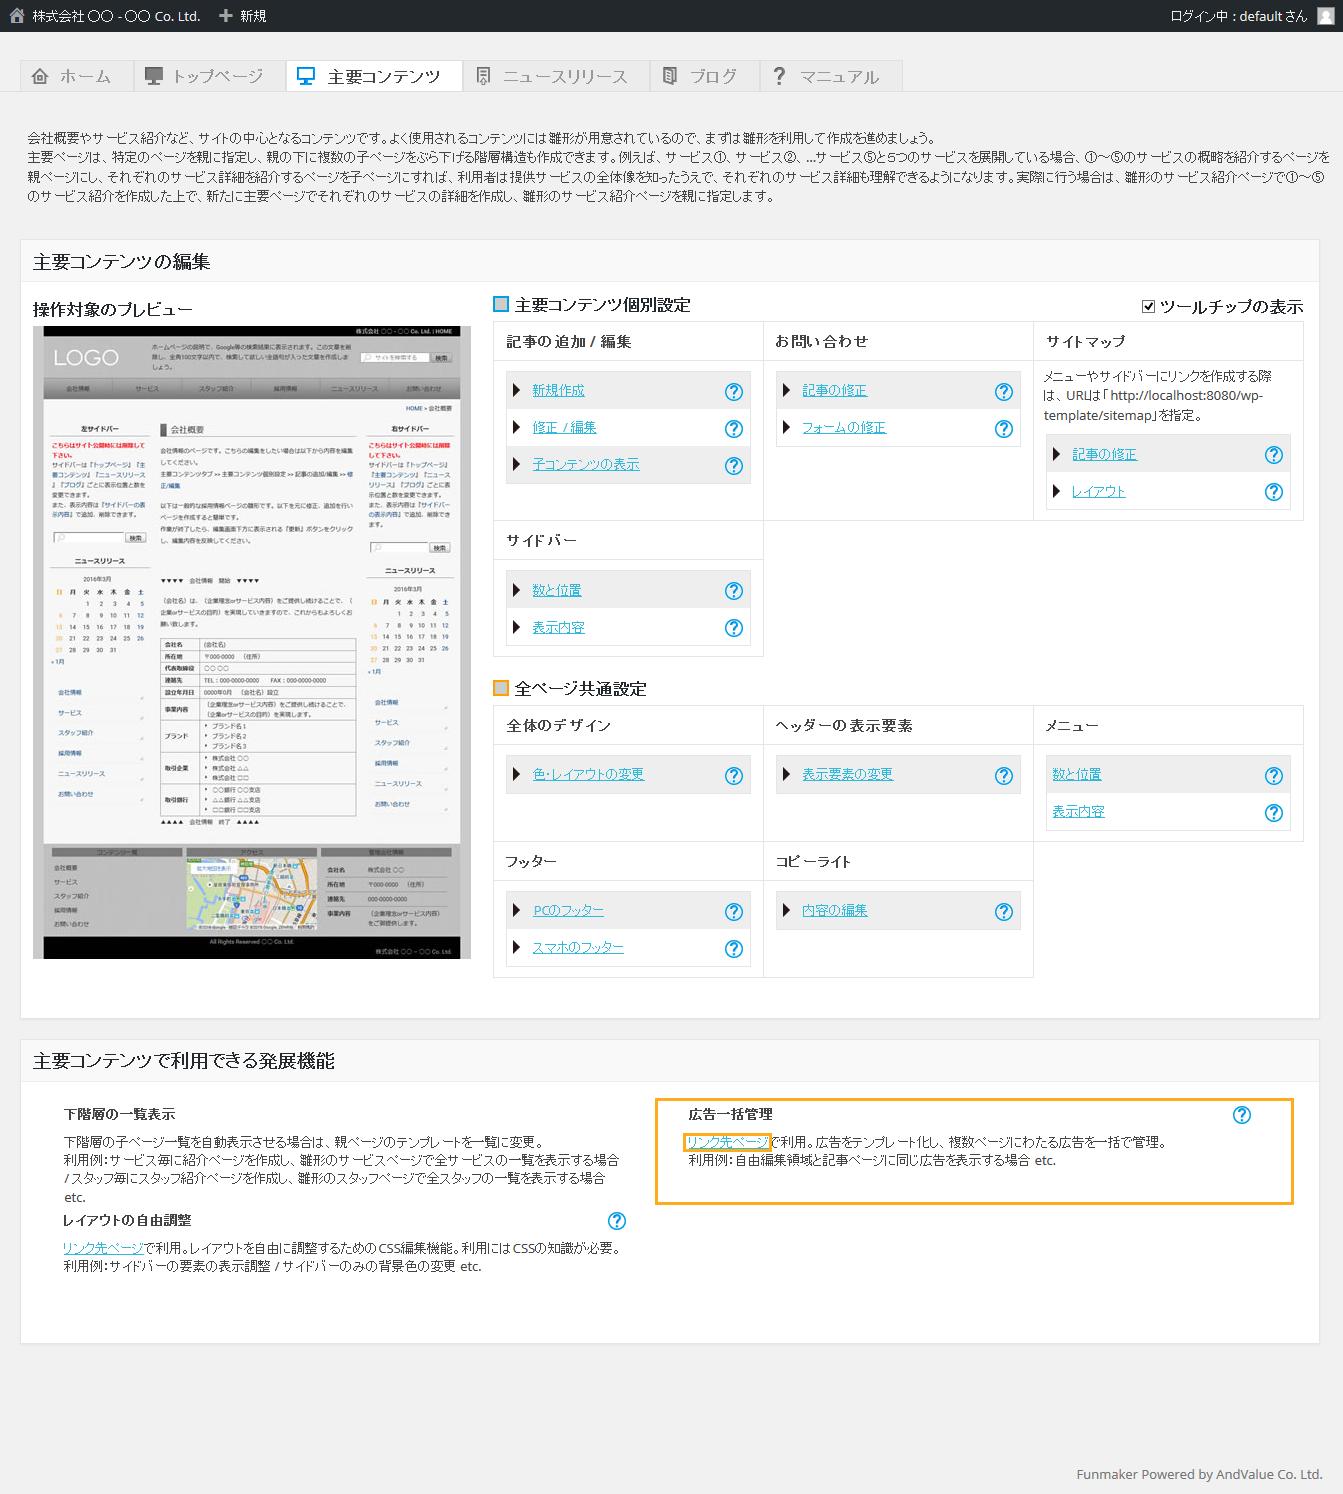 広告一括管理 - 簡単格安ホームページ作成会社 -FunMaker